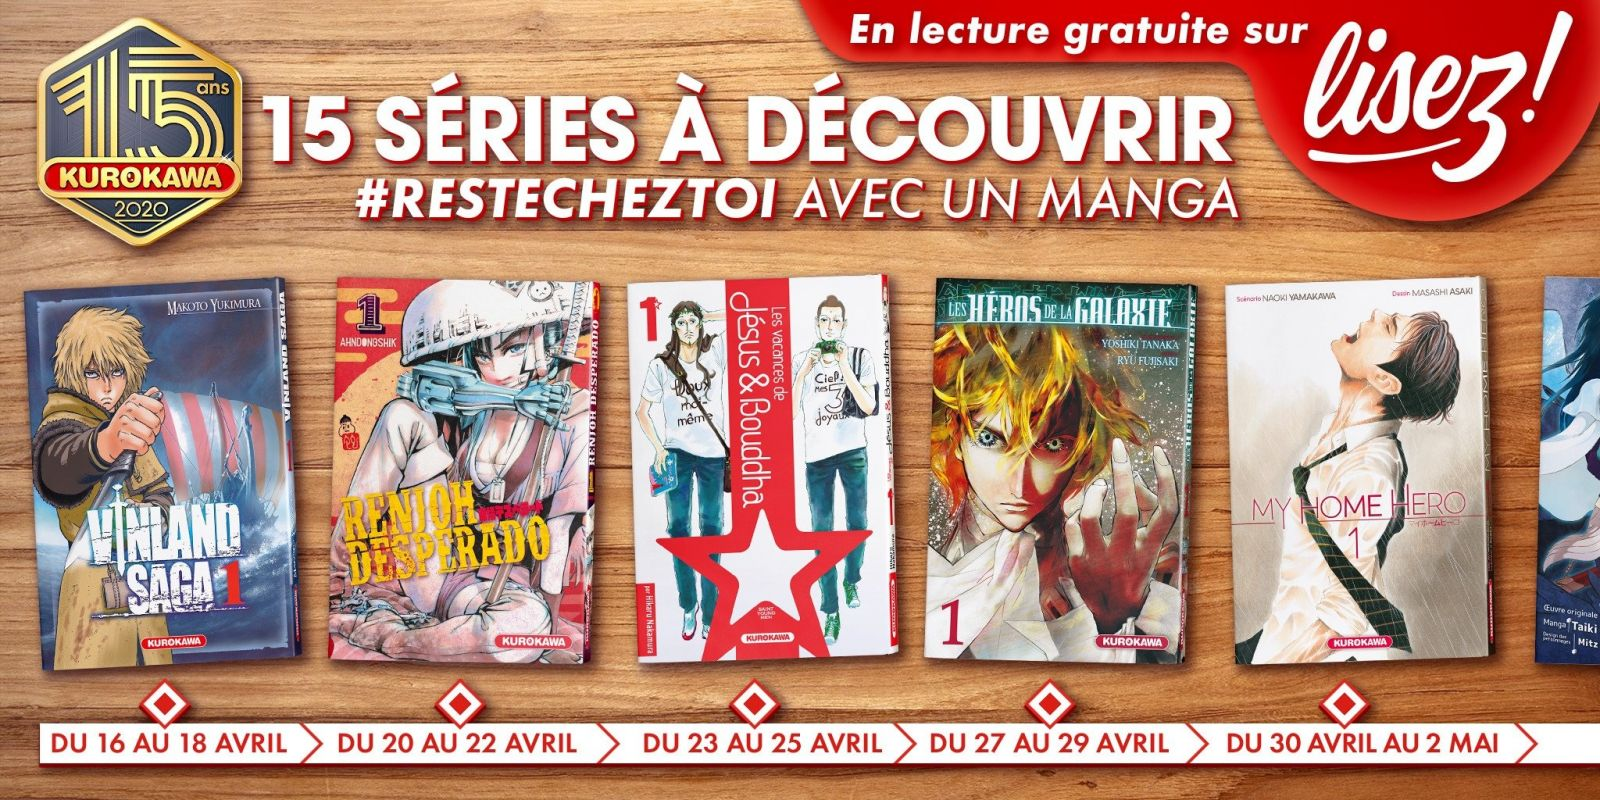 Kurokawa lance son opération #ResteChezToi avec un manga !